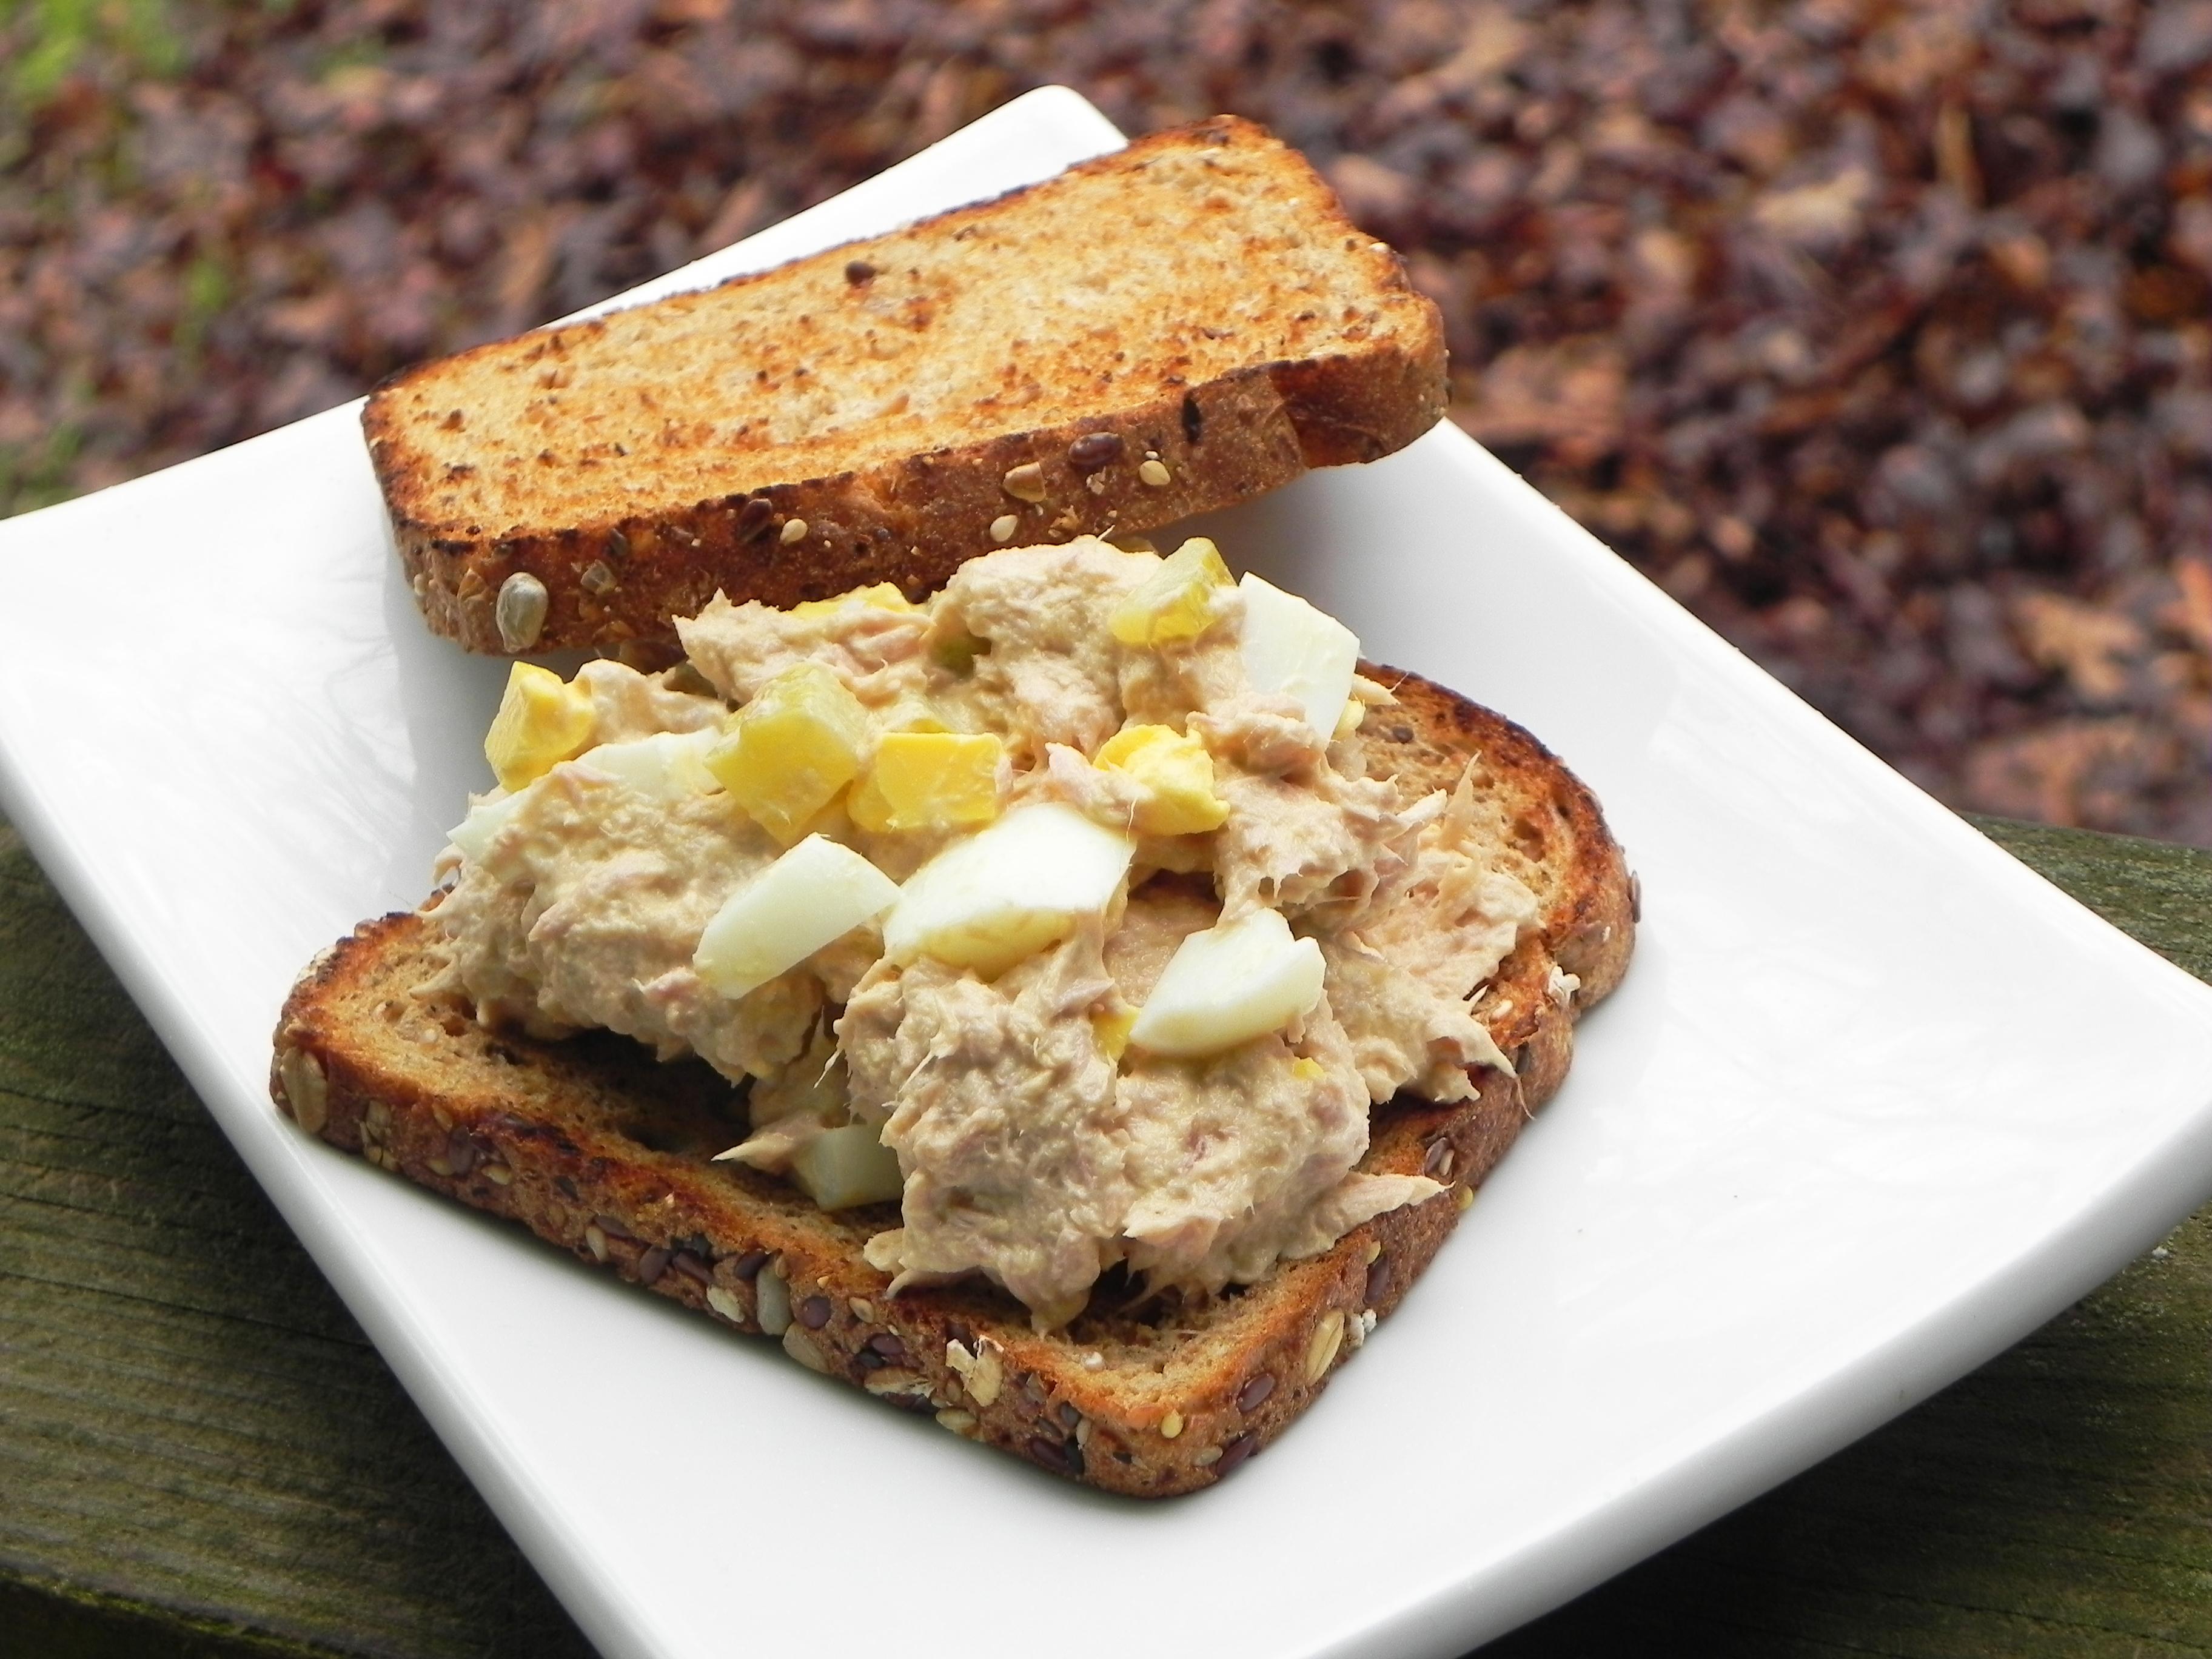 Tuna Salad with Hard-Boiled Eggs